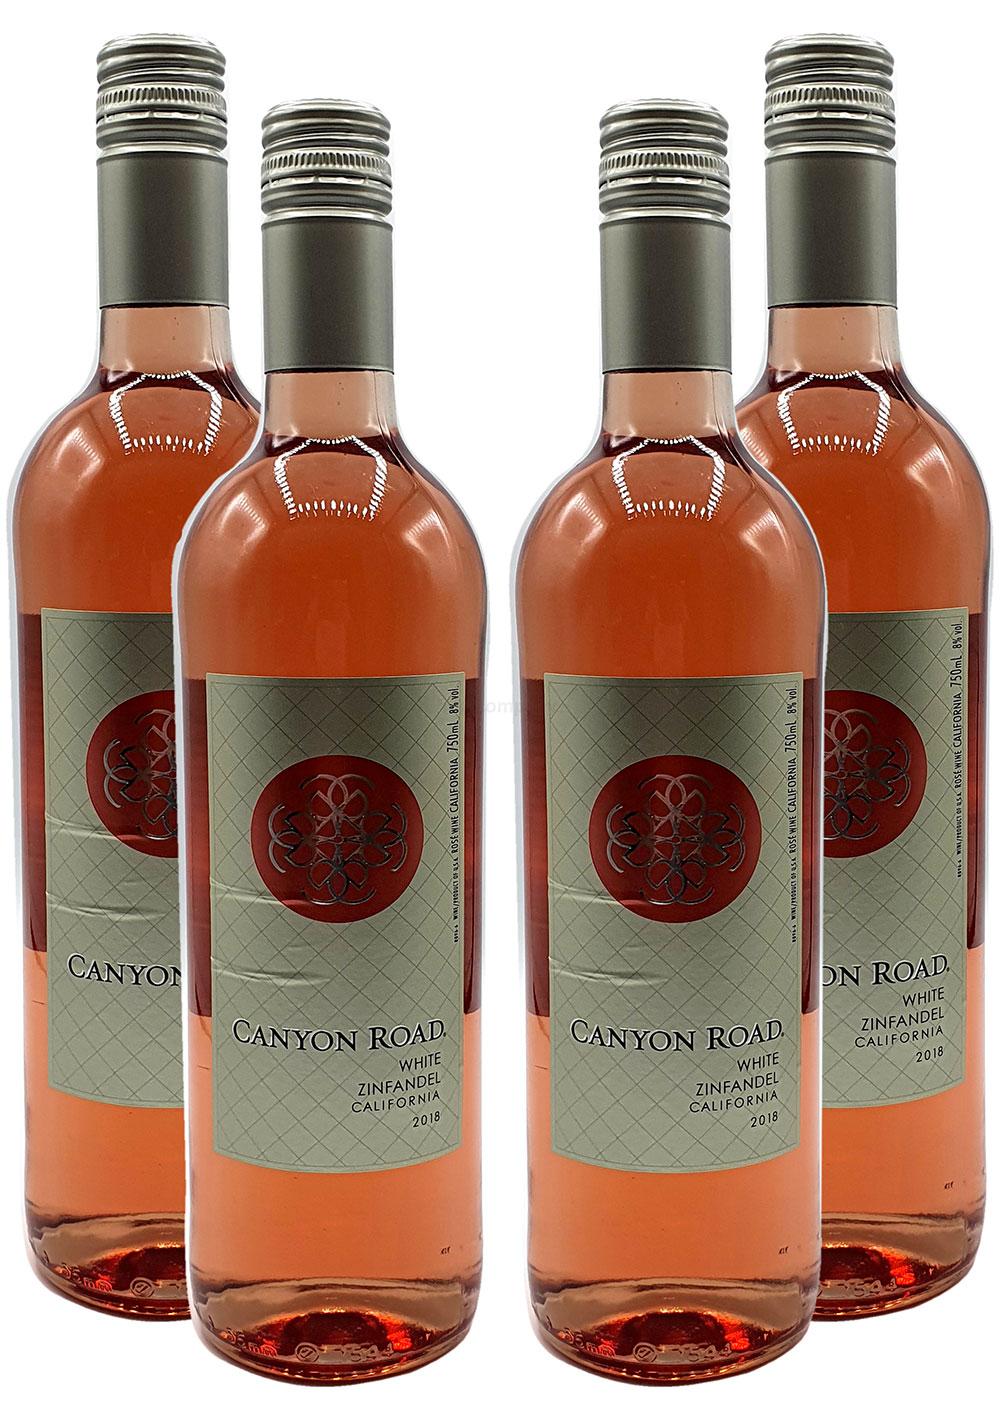 Rose Wein Set - 4x Canyon Road Zinfandel 750ml (8% Vol)- [Enthält Sulfite]